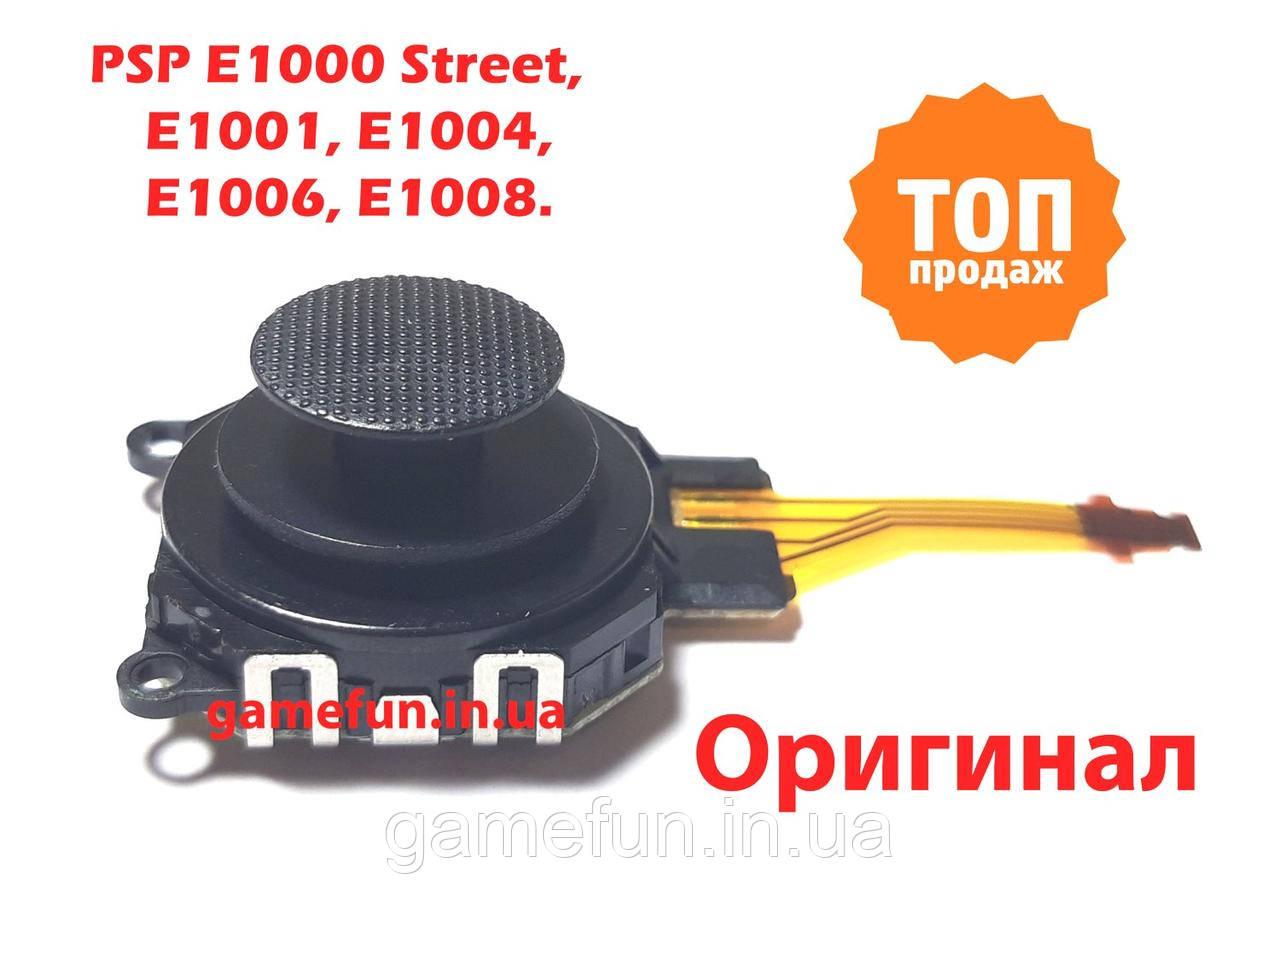 PSP E1000 Street аналоговый джойстик 3D (Оригинал)